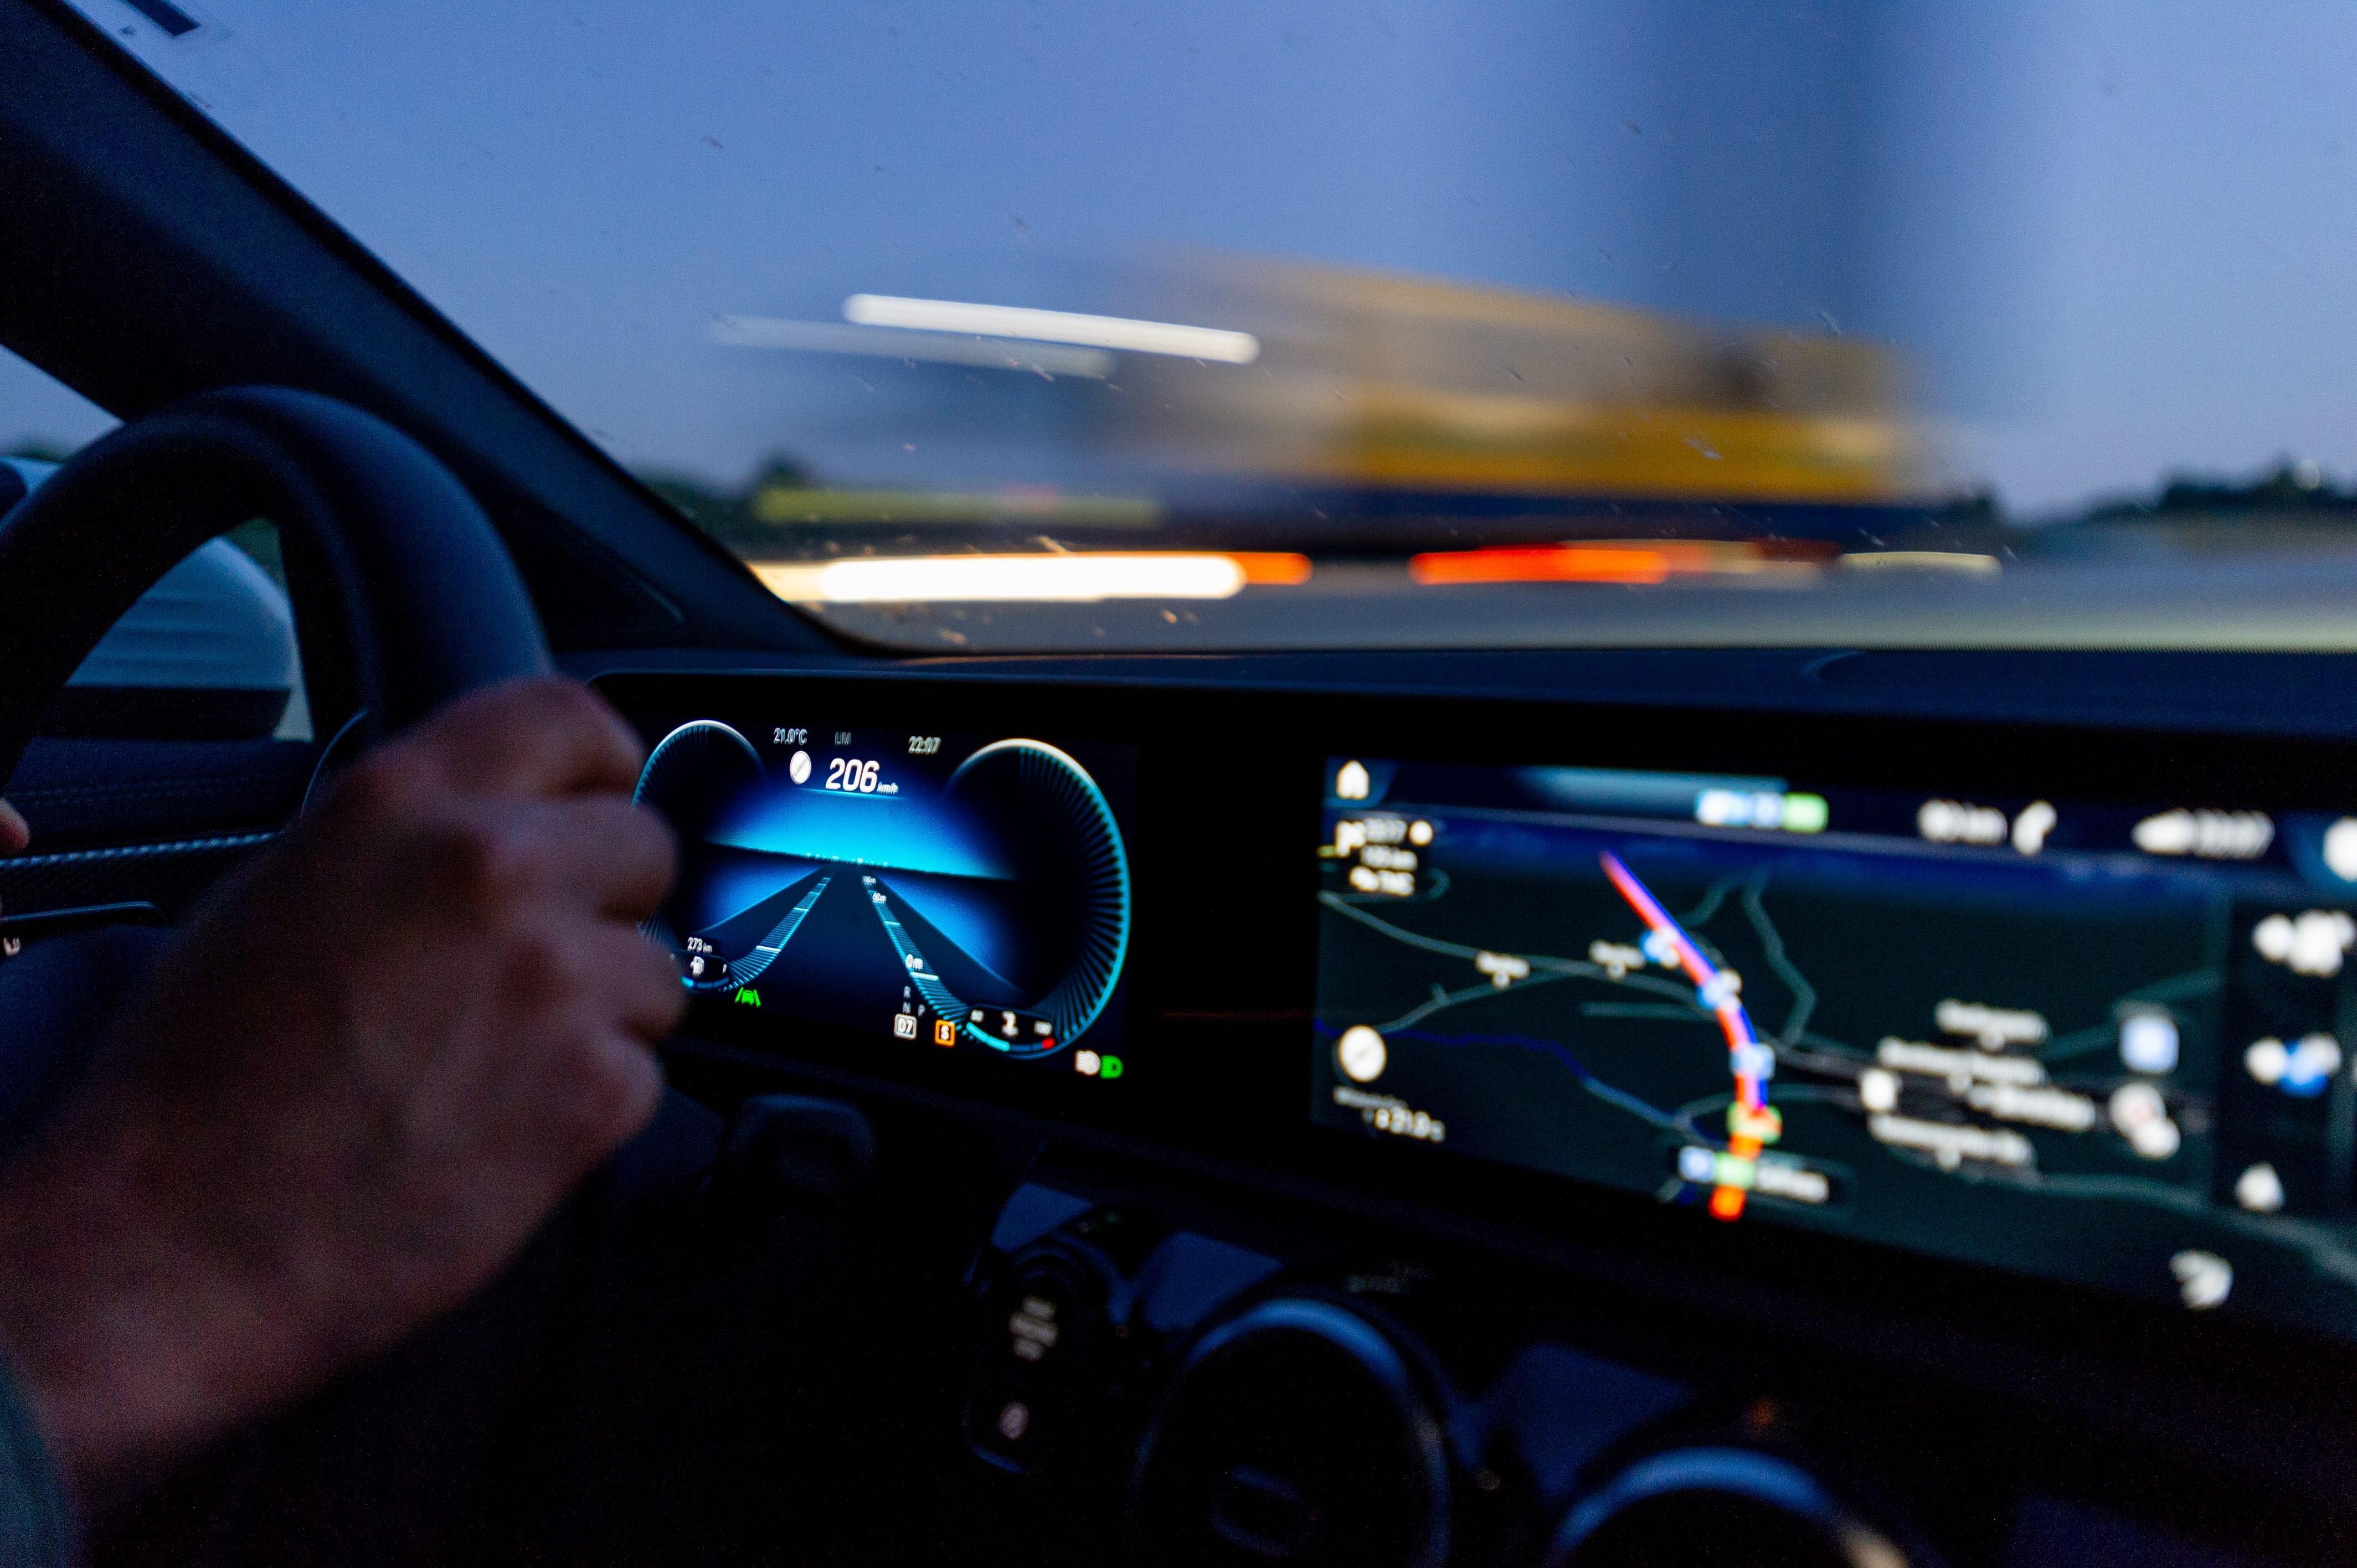 Man's hand on steering wheel; image by Randy Tarampi, via Unsplash.com.